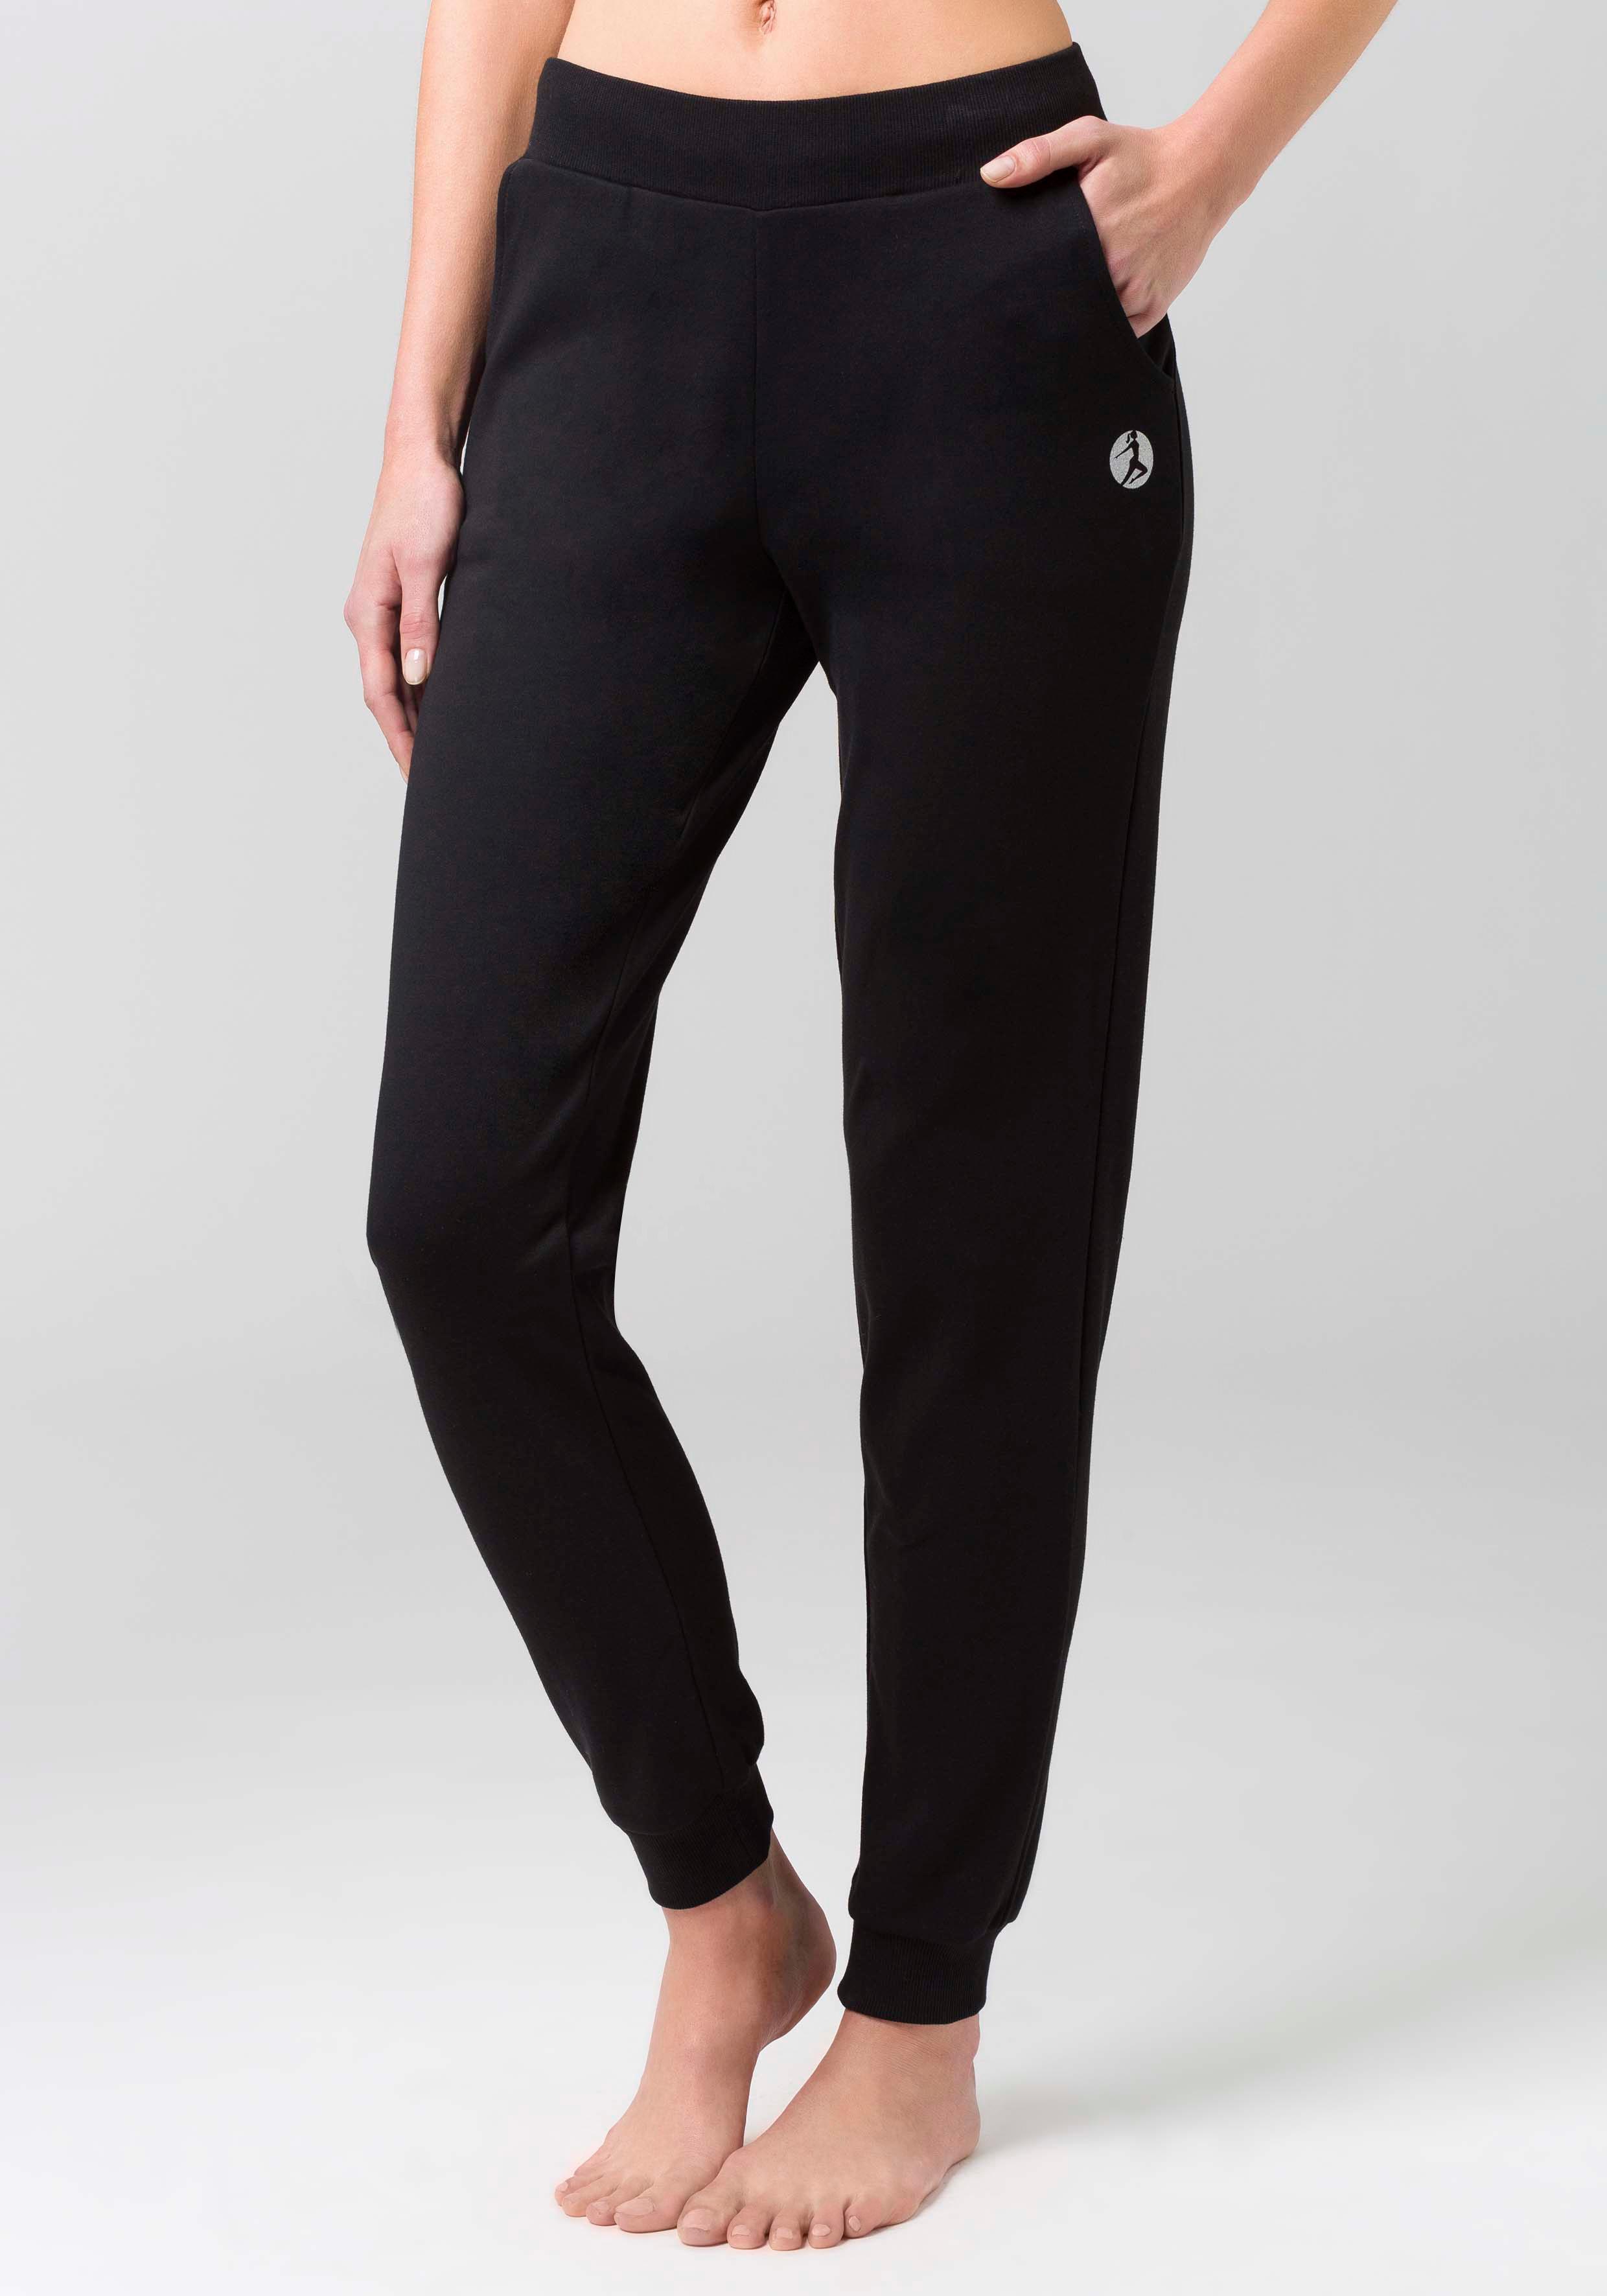 LASCANA ACTIVE Jogginghose | Sportbekleidung > Sporthosen > Jogginghosen | Lascana Active